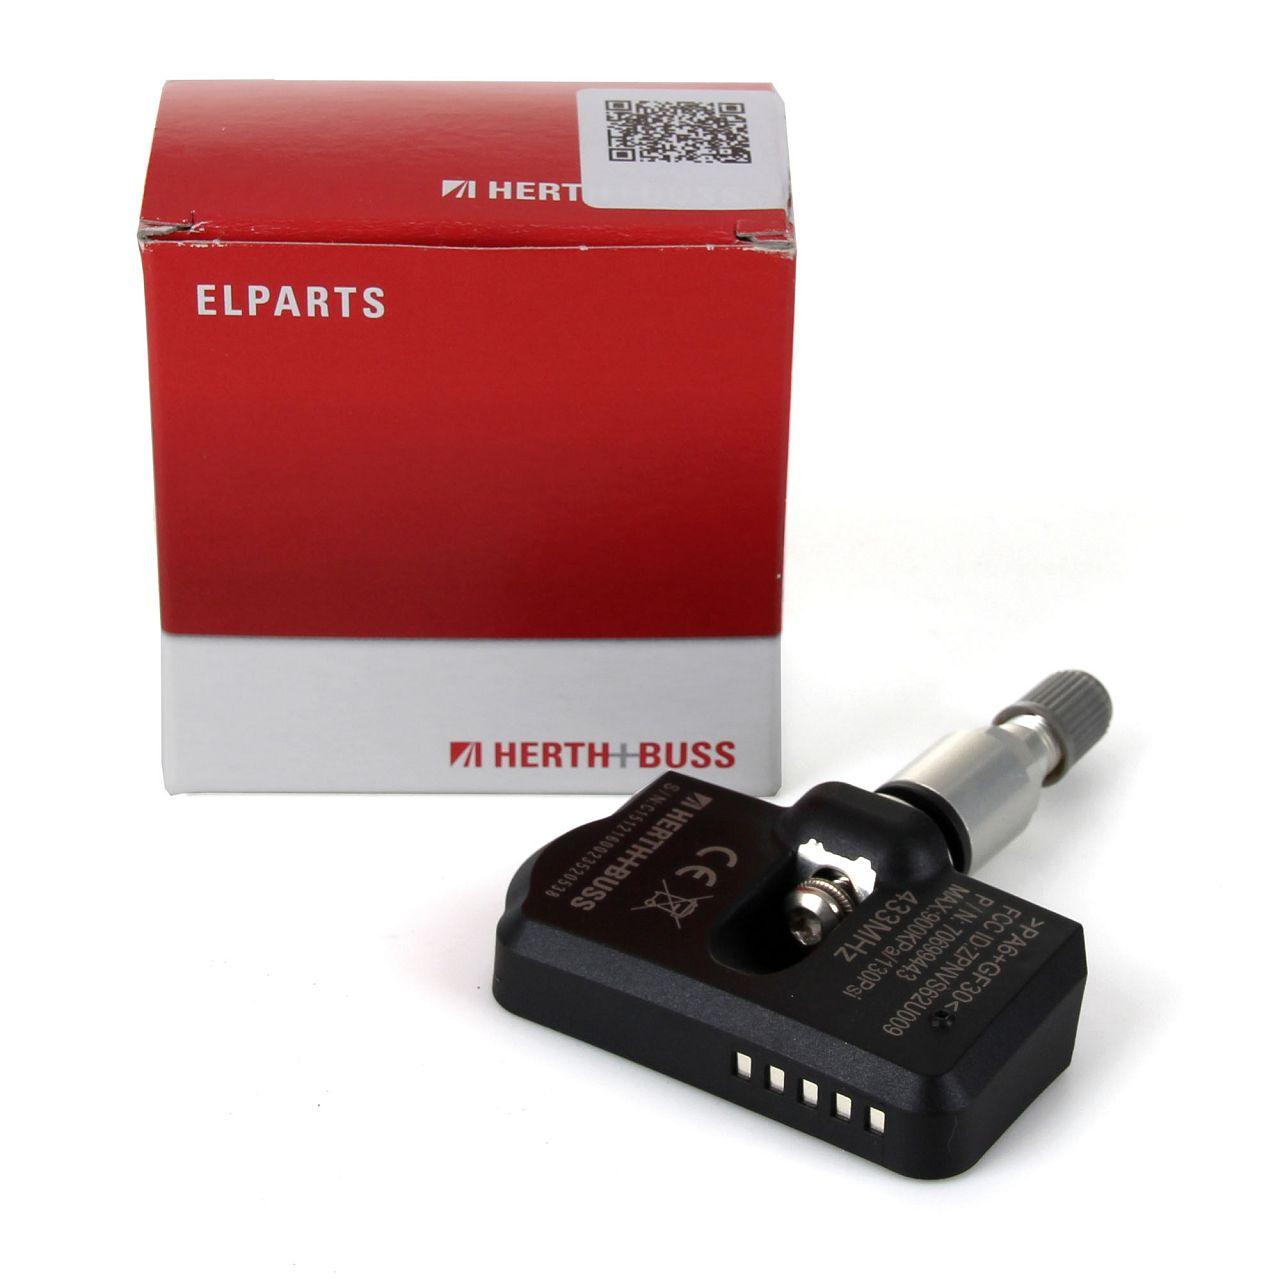 HERTH+BUSS ELPARTS Radsensor Reifendrucksensor RDKS TPMS 70699443